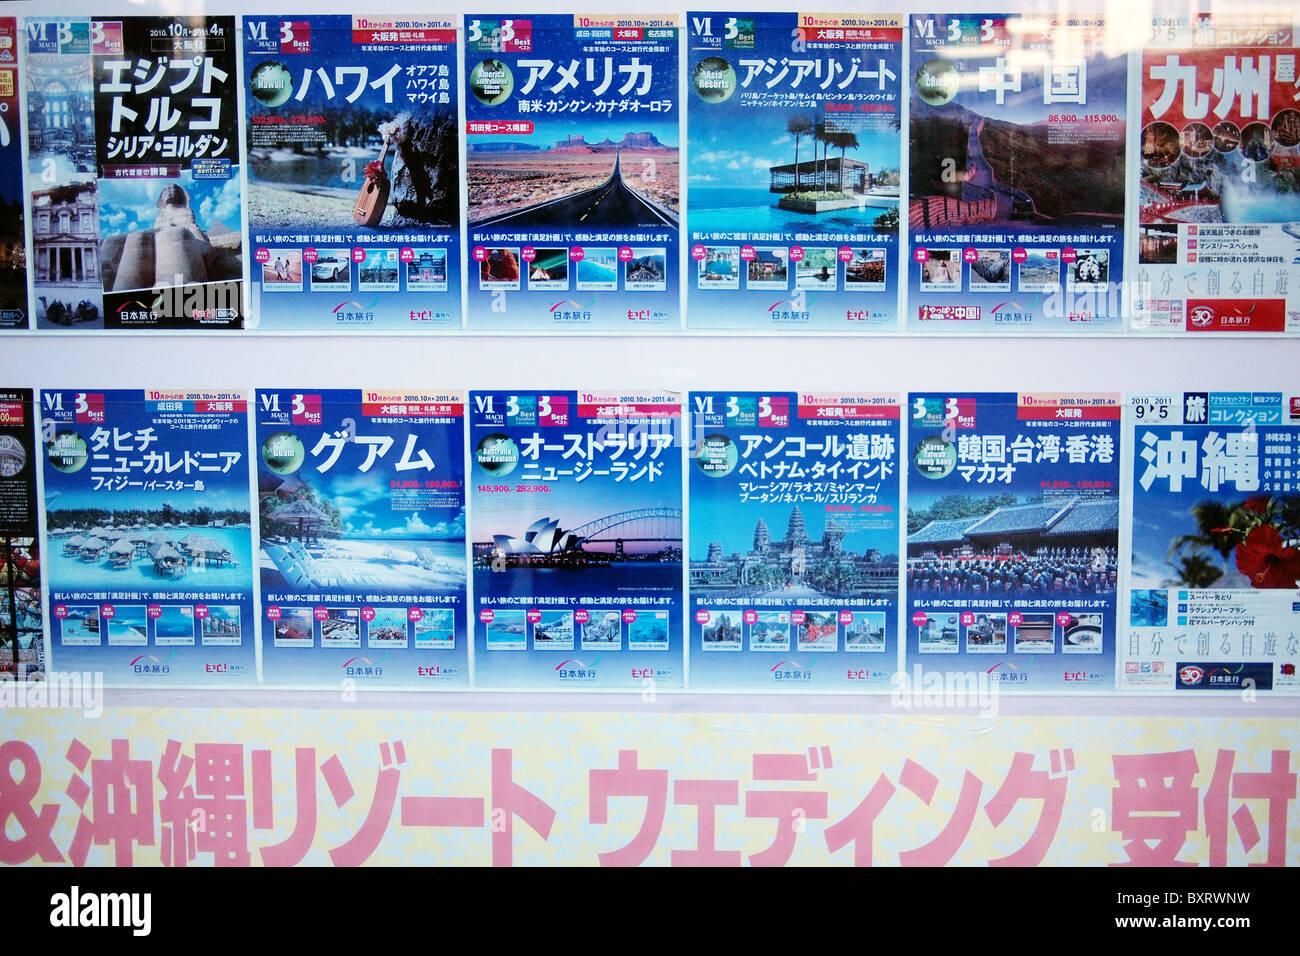 Nippon Reisebüro Tourismus Urlaub Plakat in Japan Stockbild